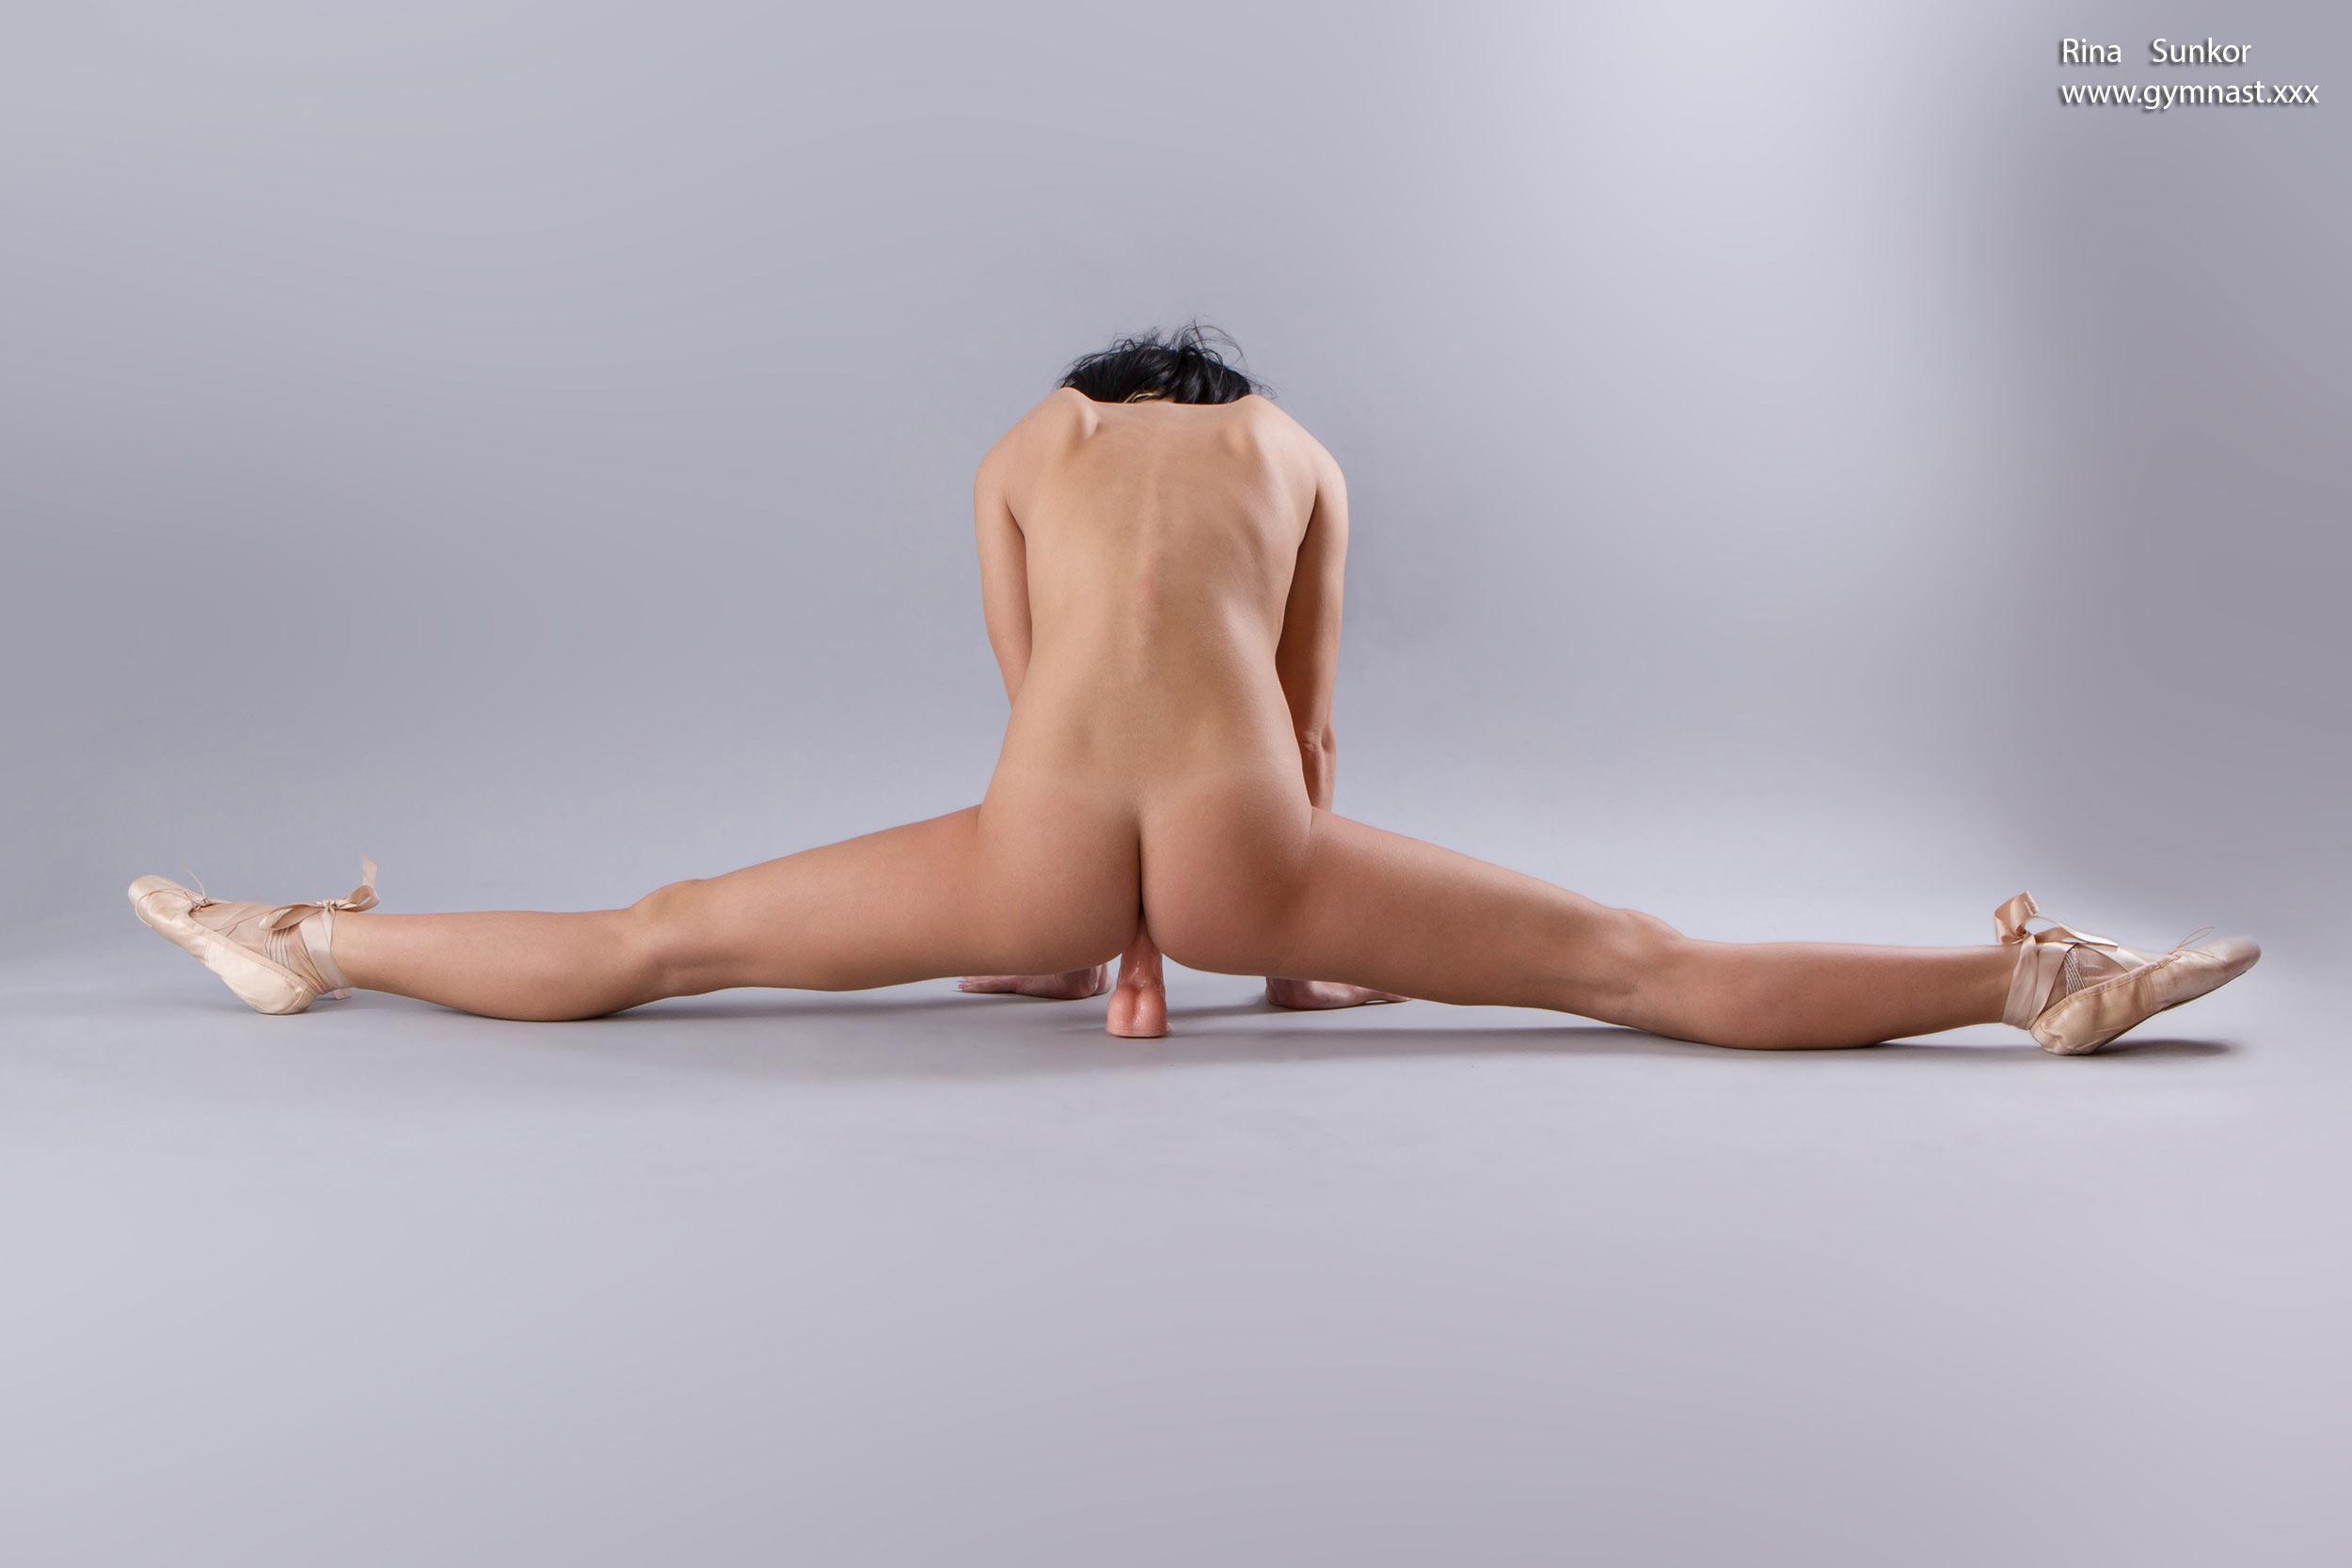 Ballett Porno